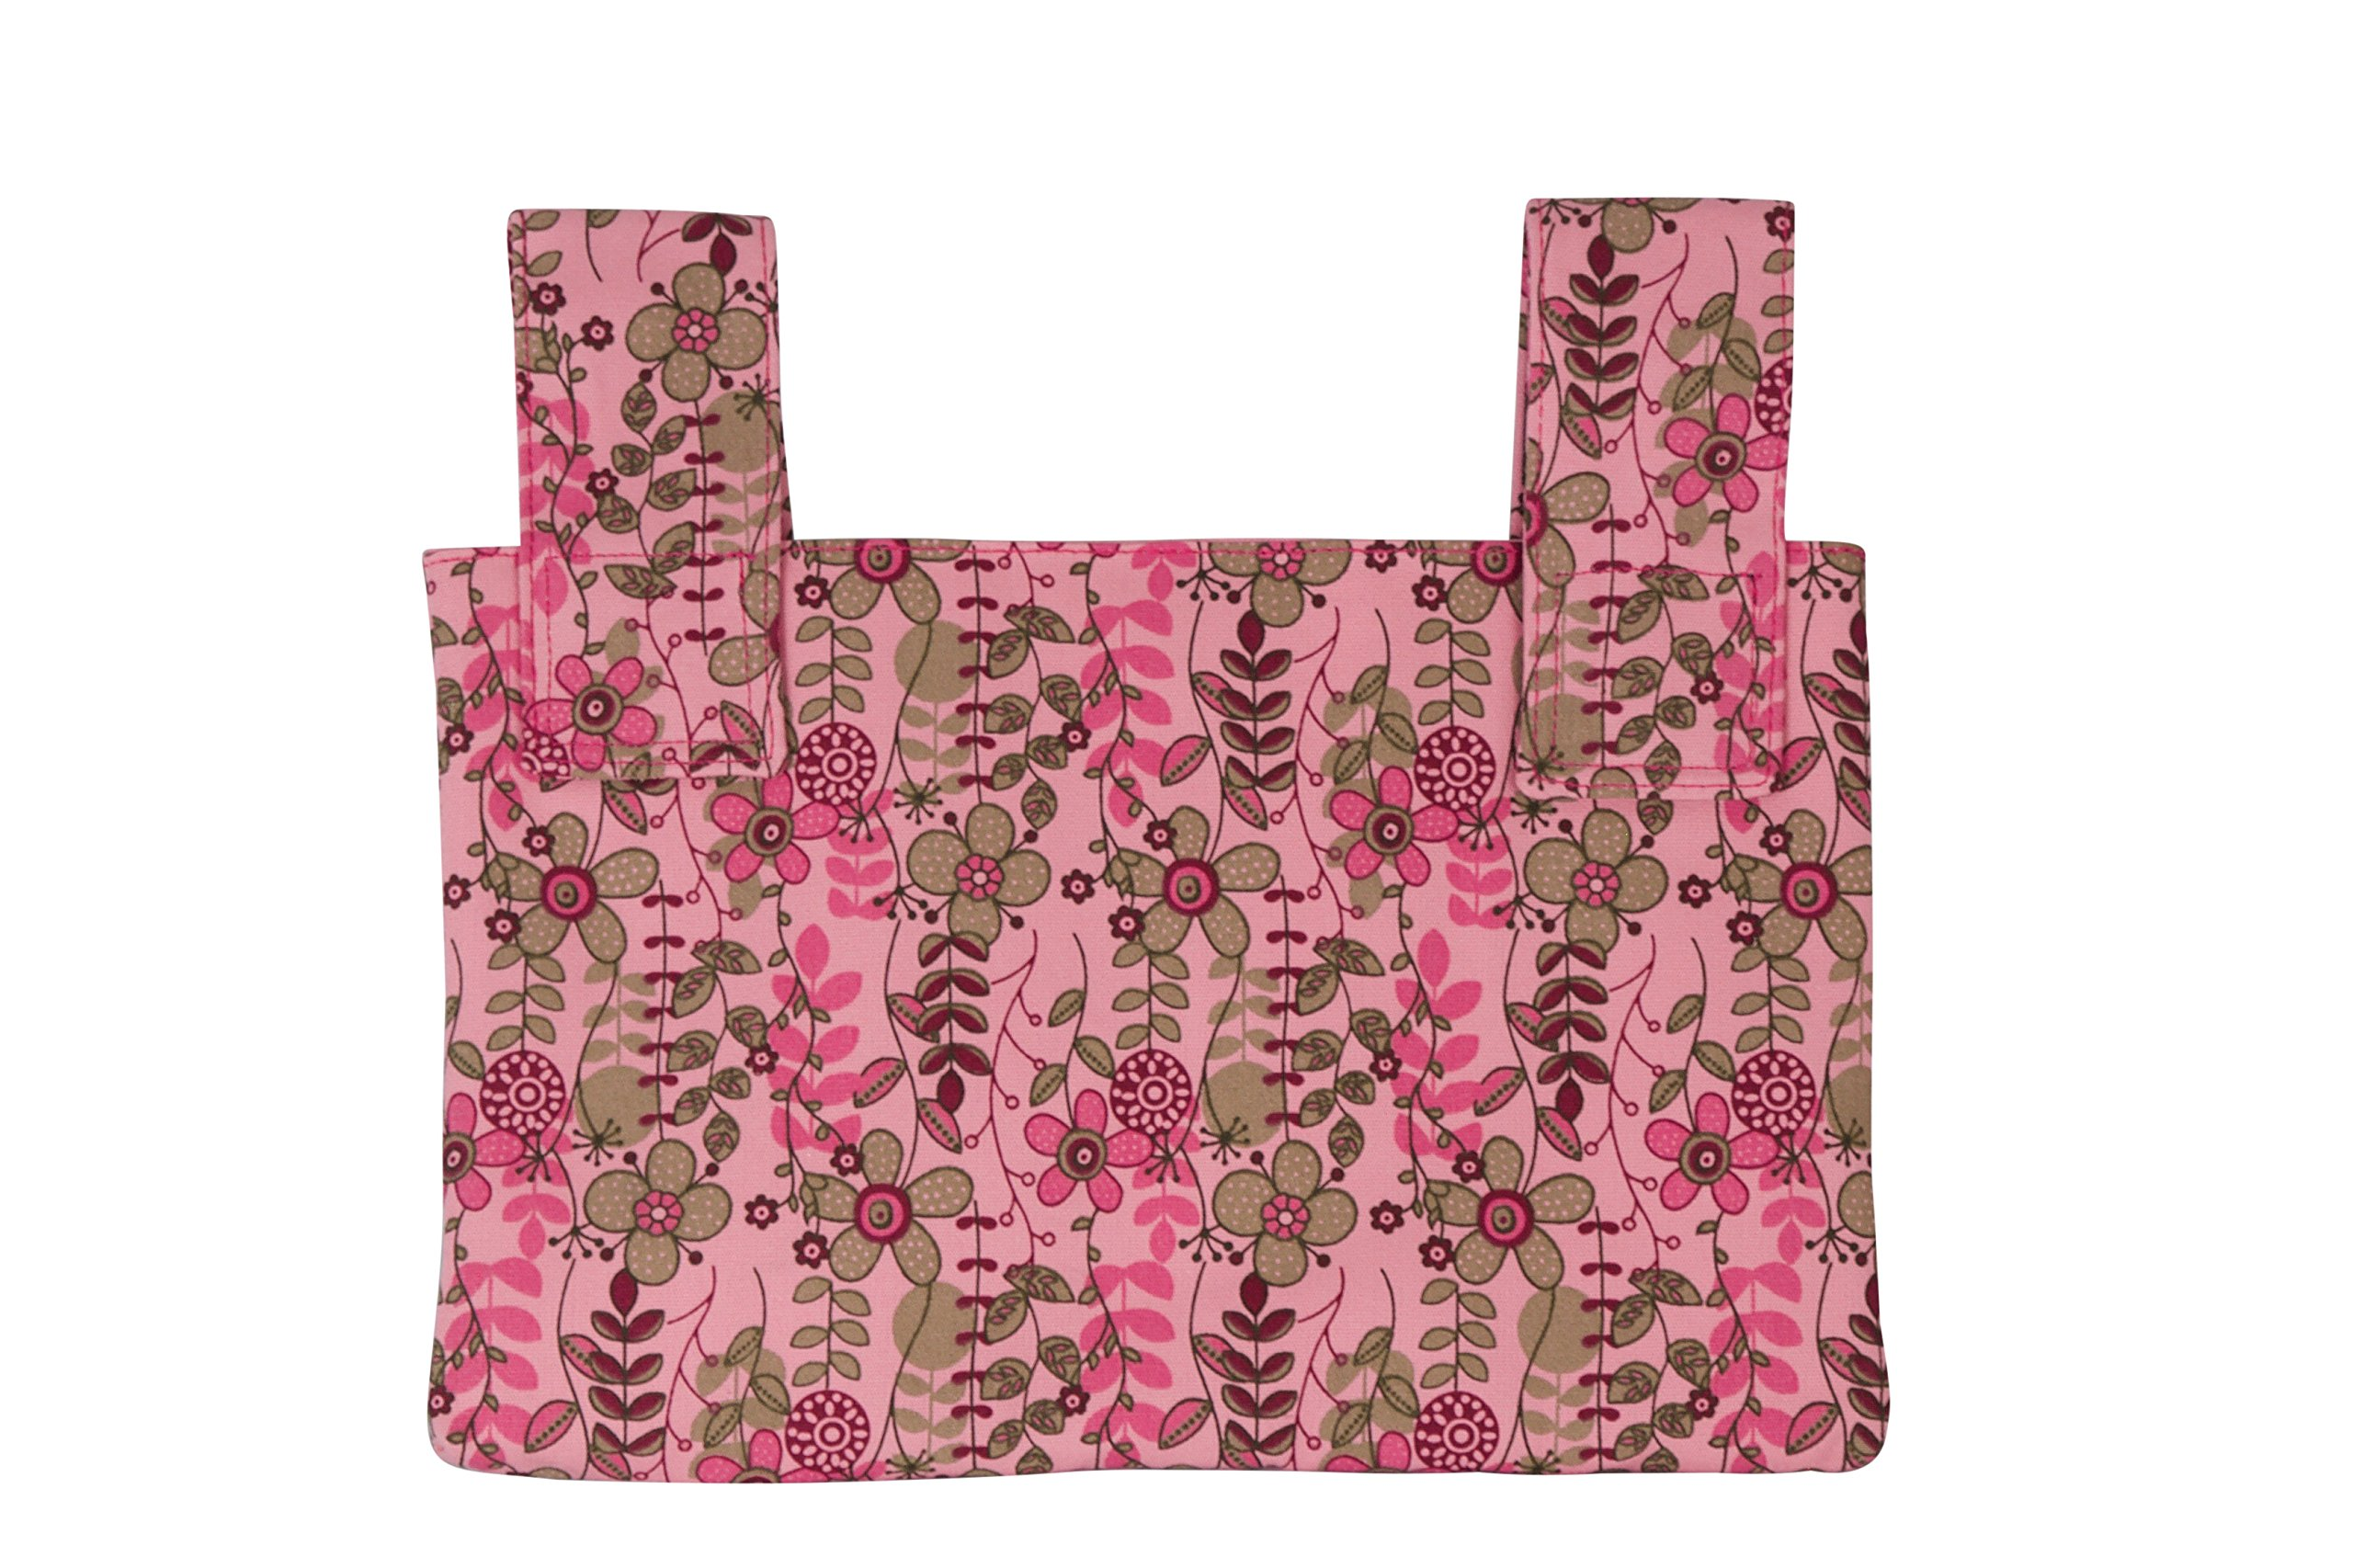 Qelse Designer Walker Bag 3-Pocket Tote Organizer Pouch PINK FLORAL Accessories for Beautiful Mobility